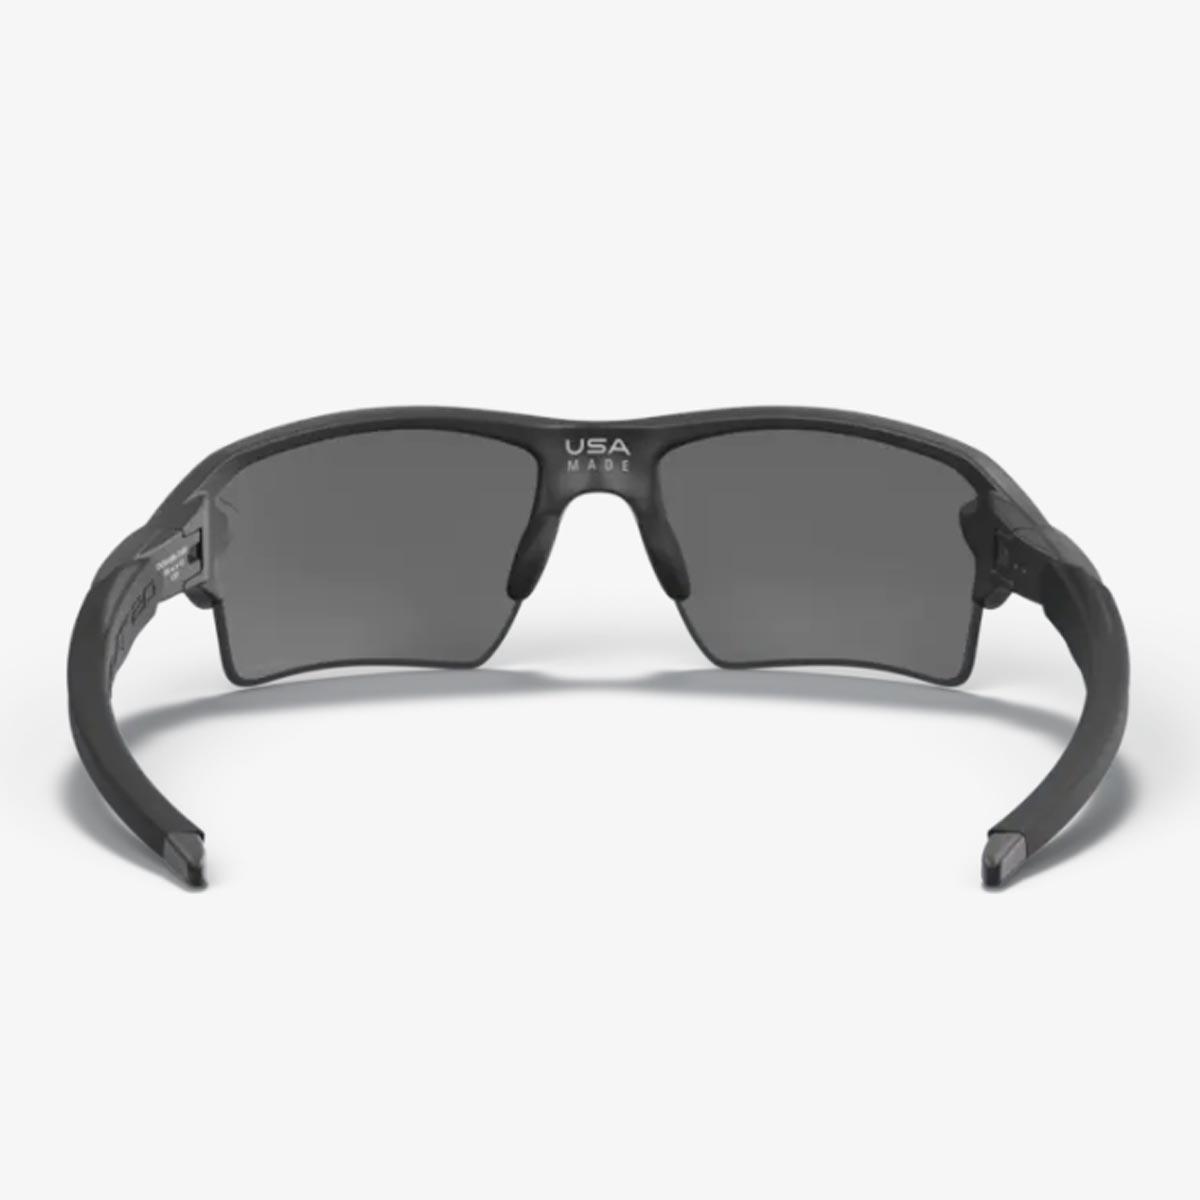 Oculos Para Ciclismo Oakley Flak 2.0 XL Preto Fosco Com Lente Prizm Road Black Escura